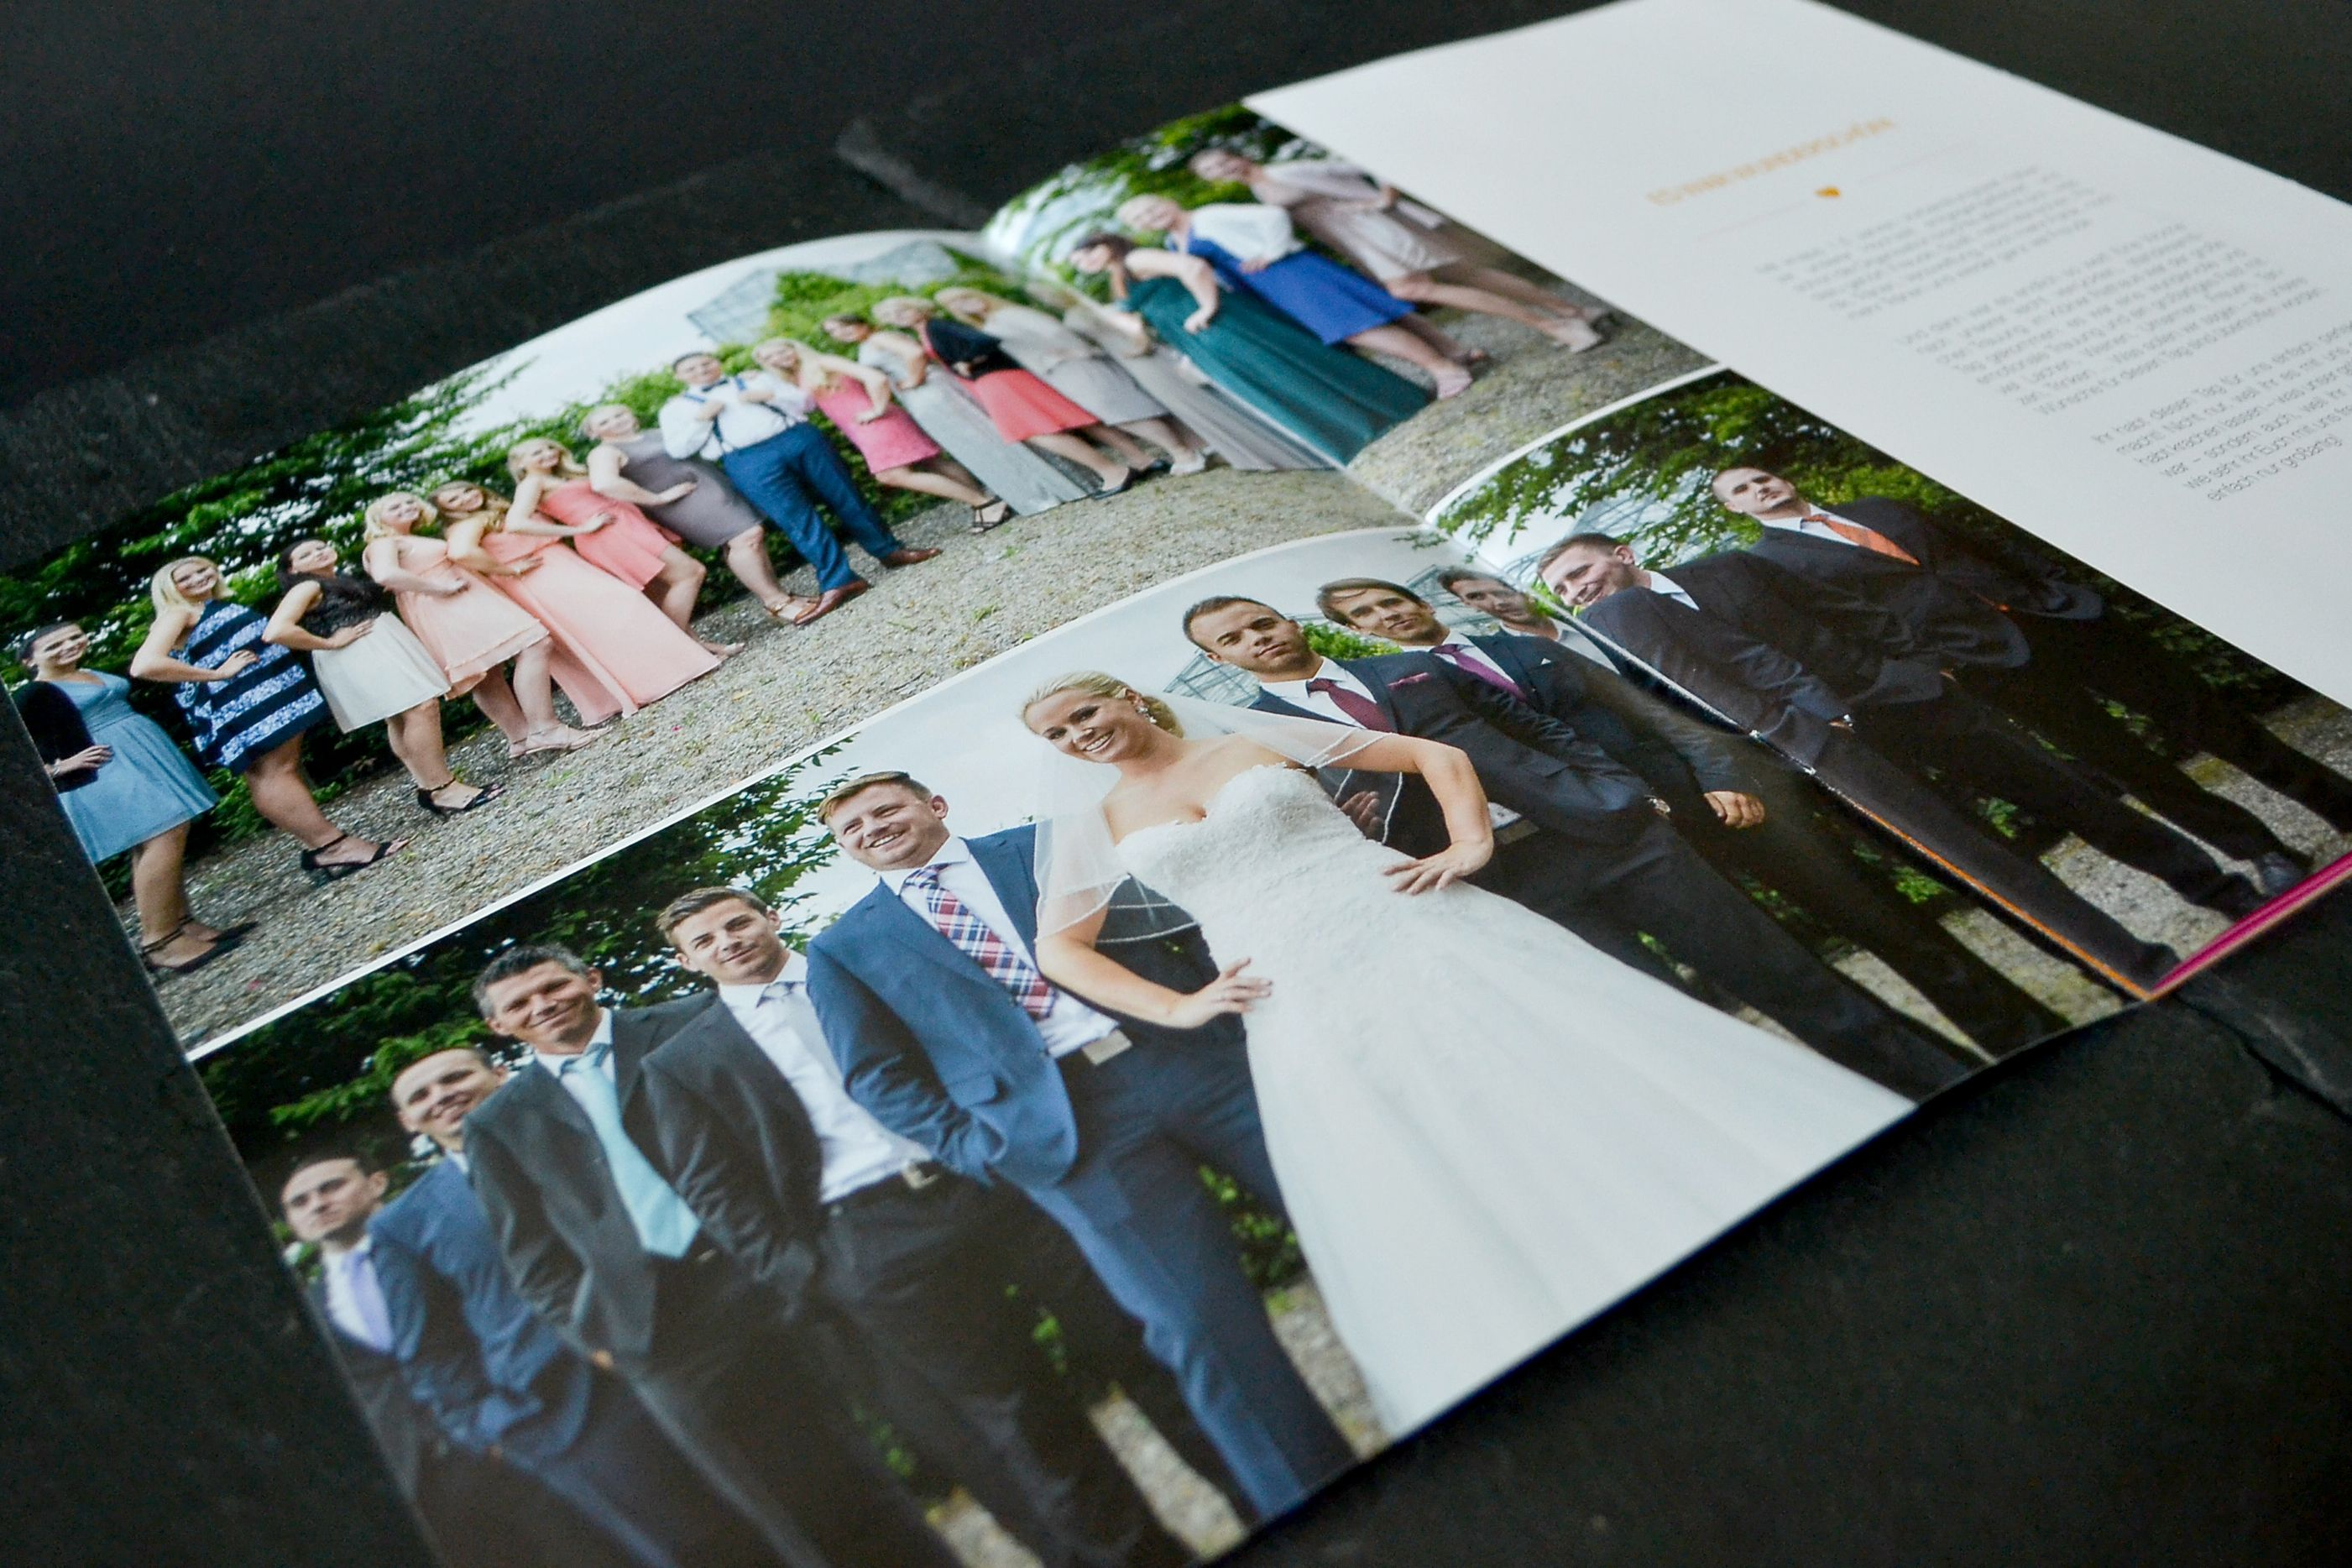 Danksagung mal anders - als Magazin #Dankeskarte #Hochzeit